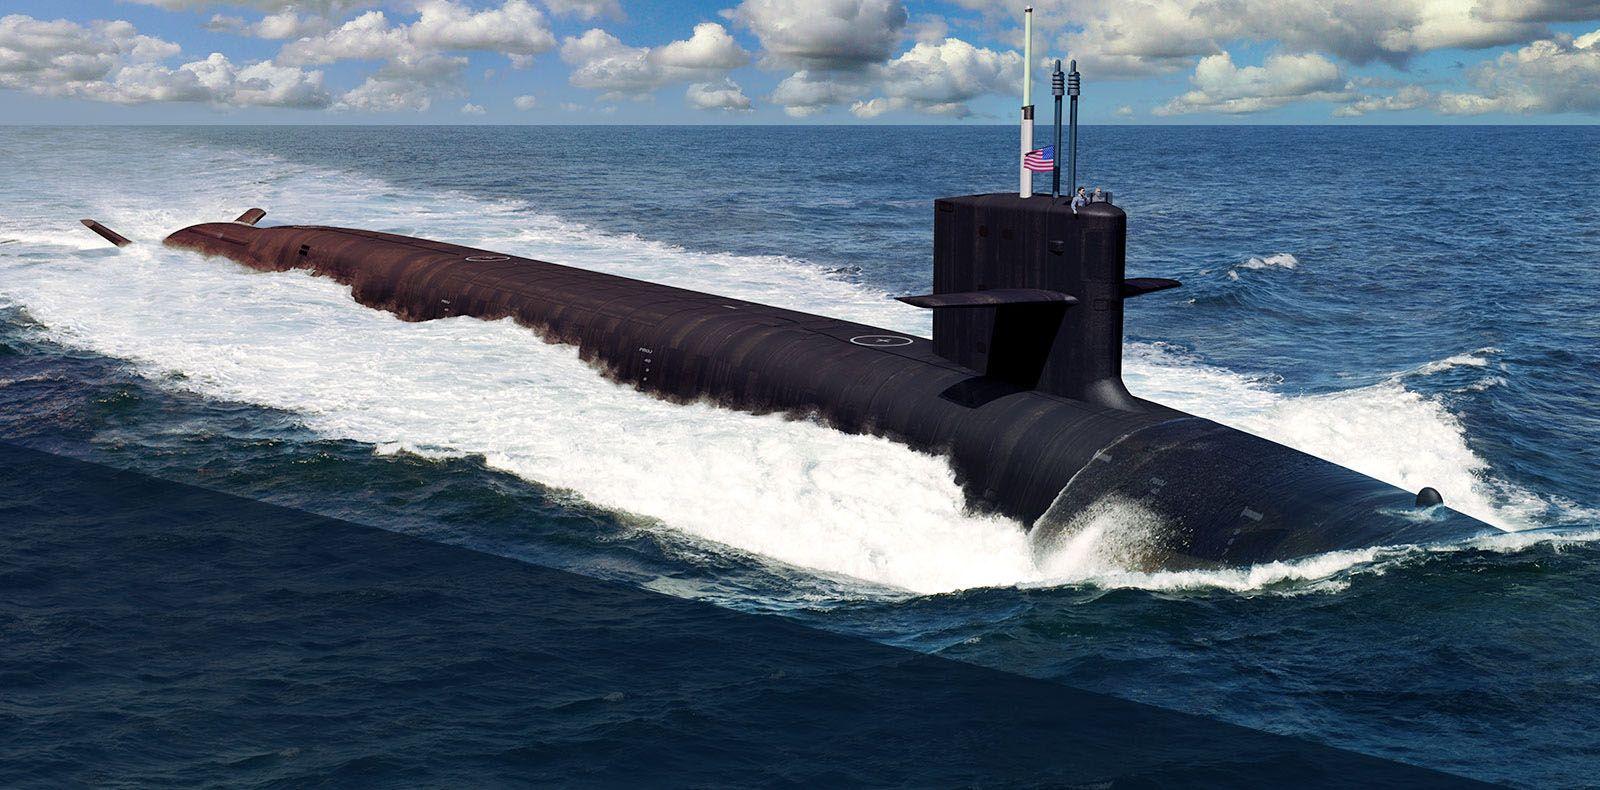 Columbia_class nuclear submarine